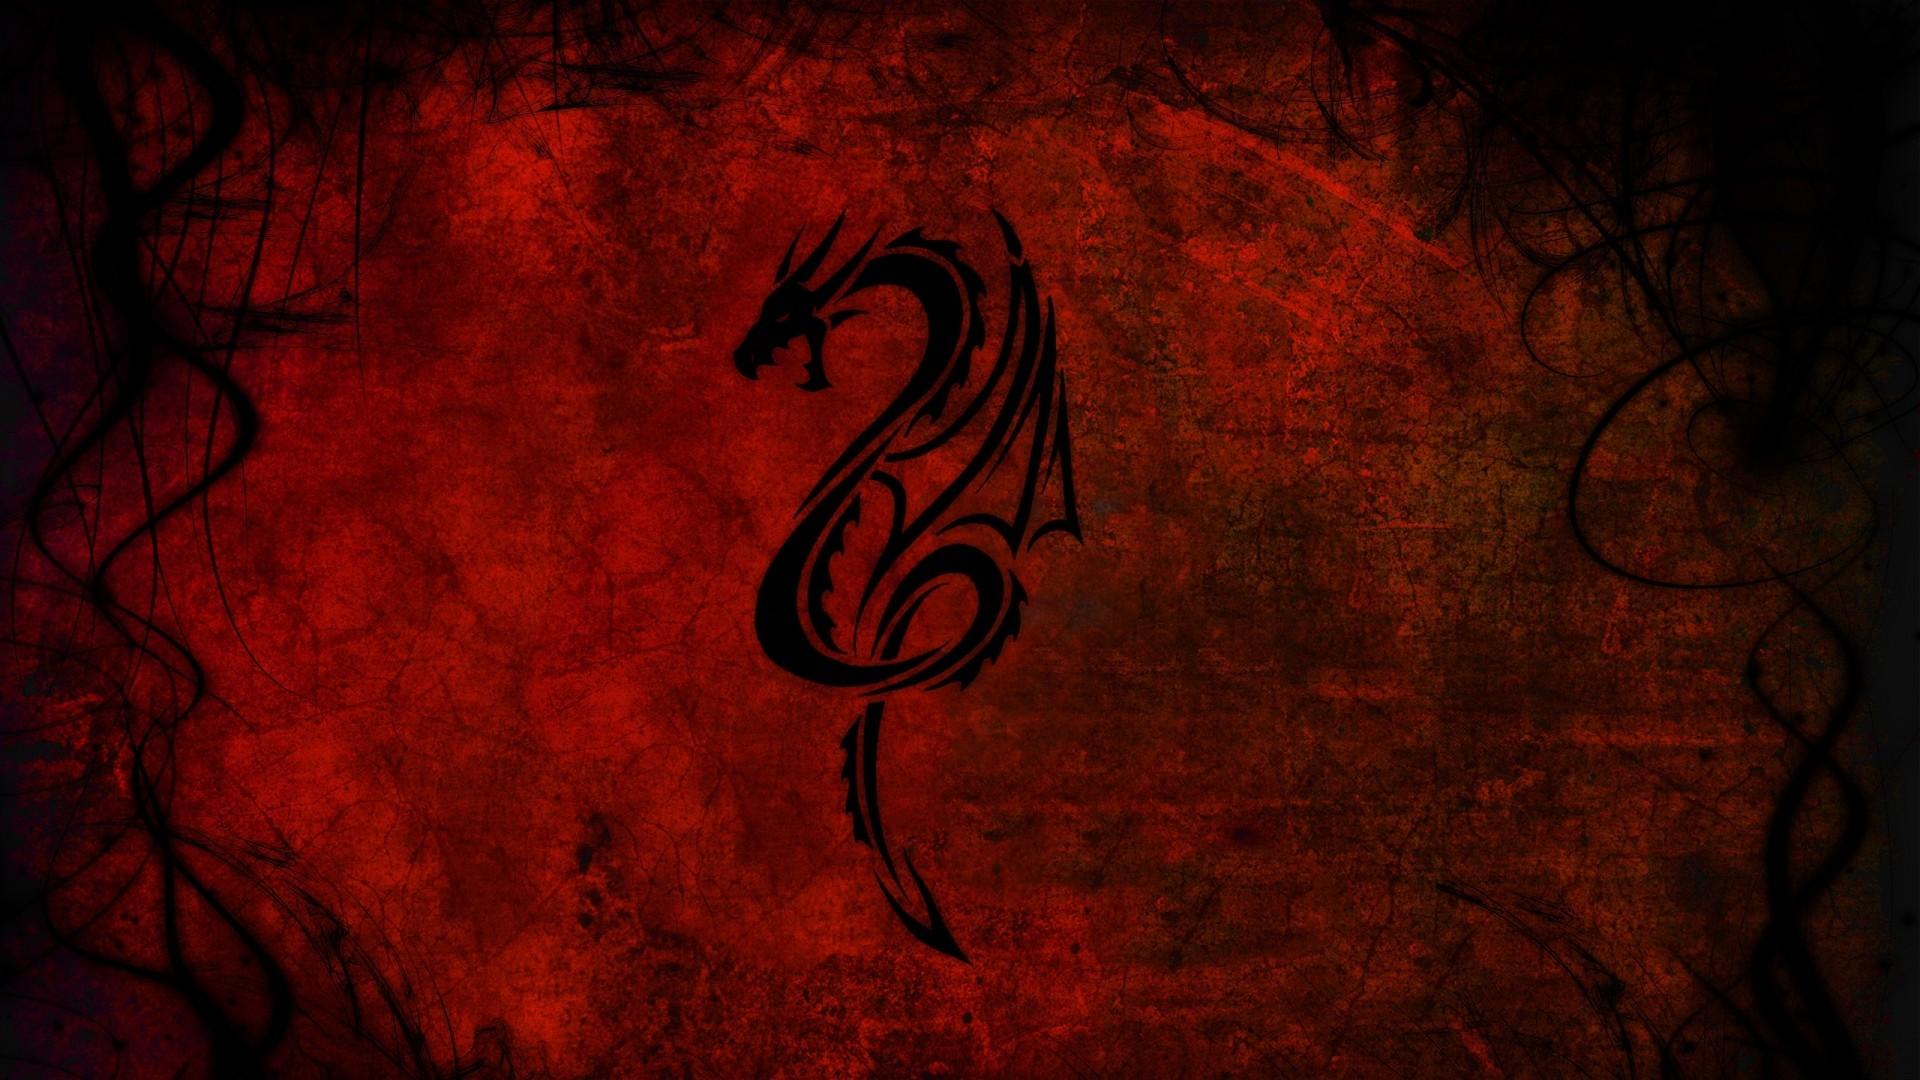 … Background Full HD 1080p. Wallpaper dragon, pattern, red,  black